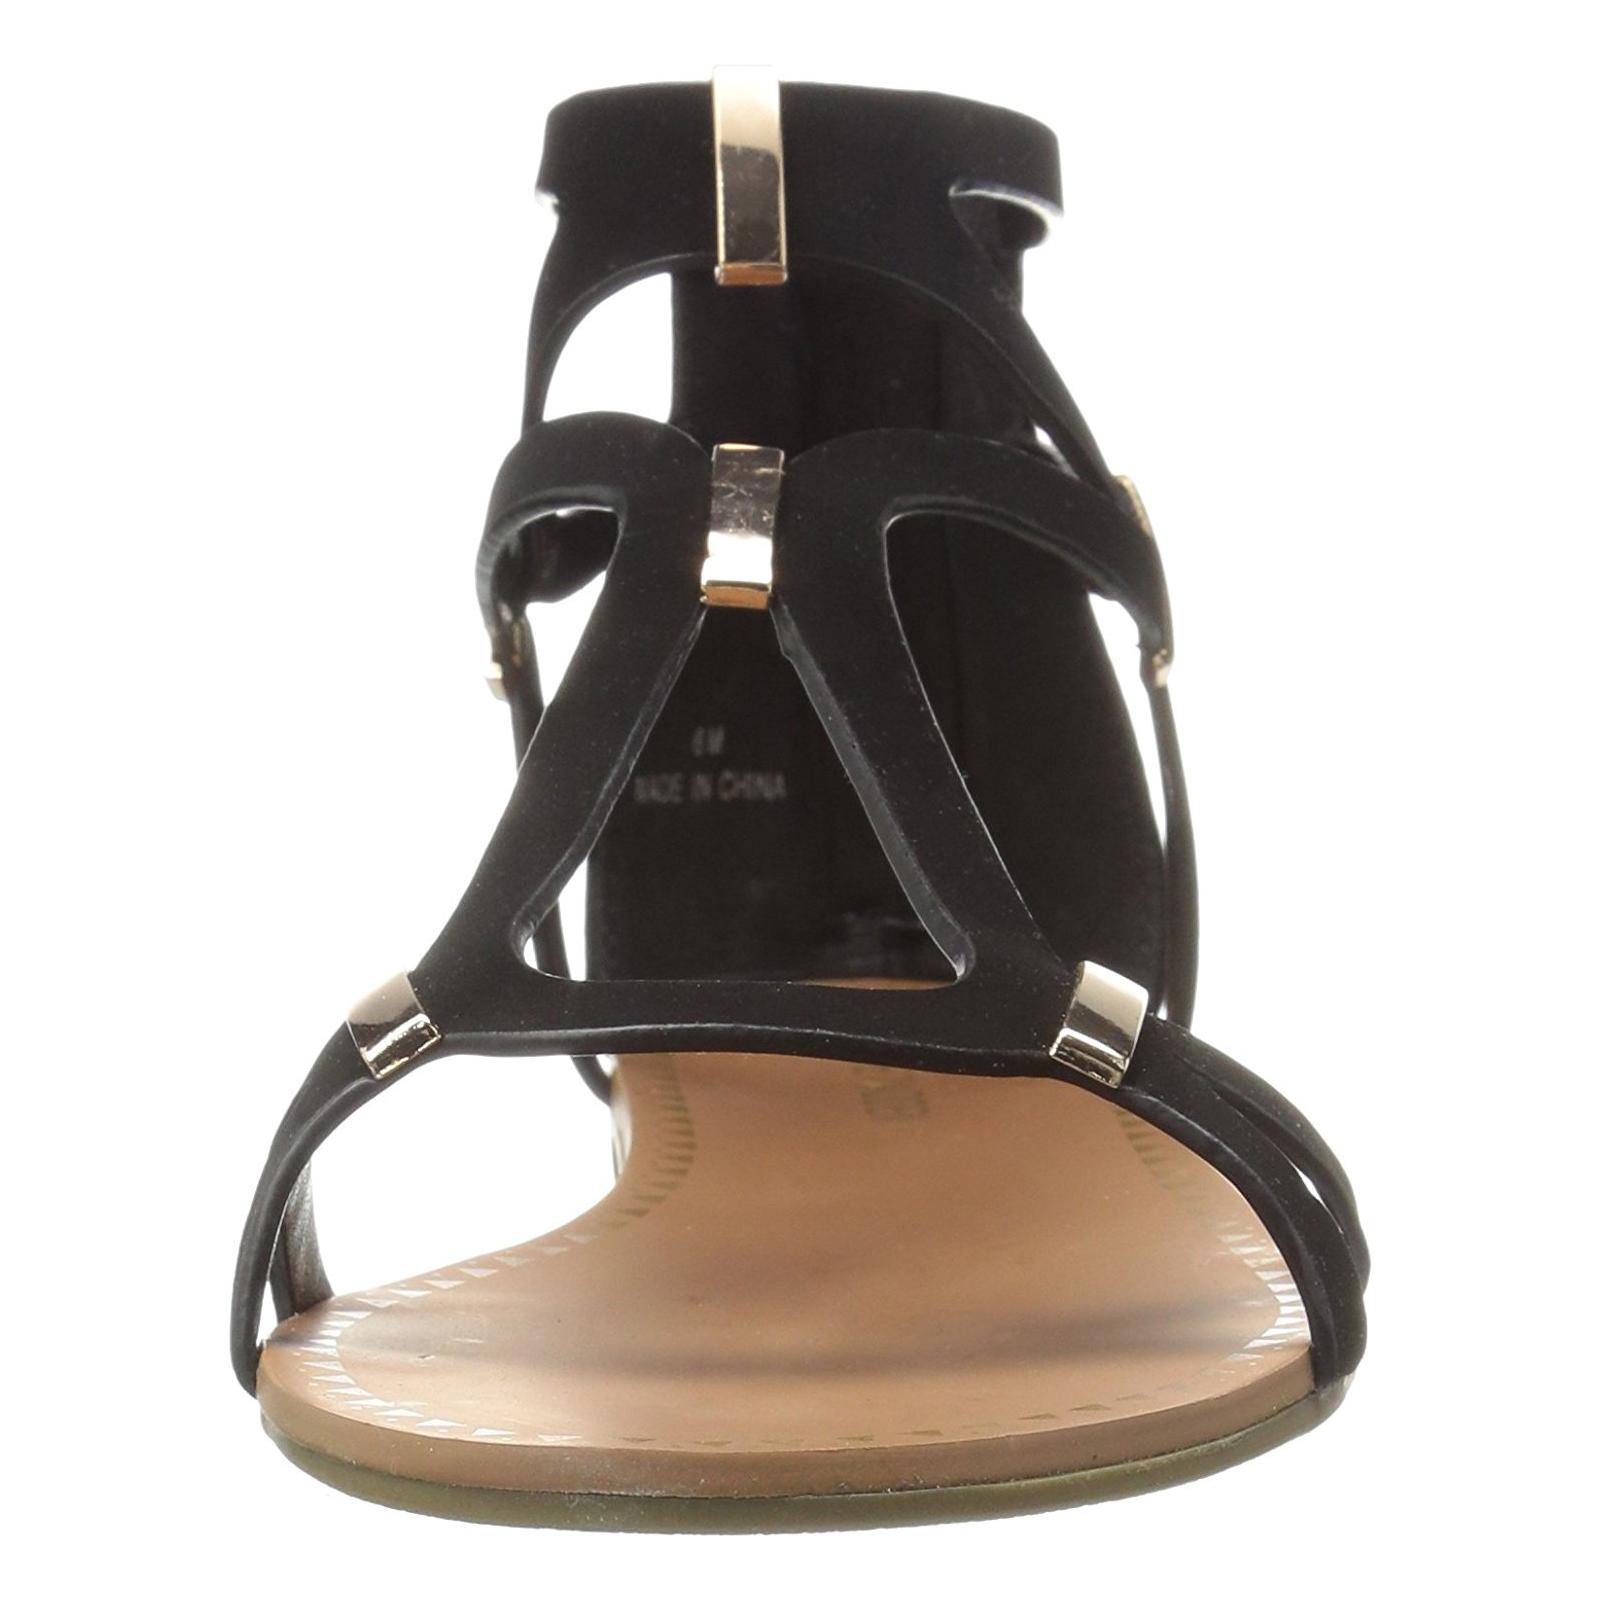 24c2449f9 Steve Madden Sandali Junyaa Black Nubuck Pu Nero 3cd391 - higrotemper.es